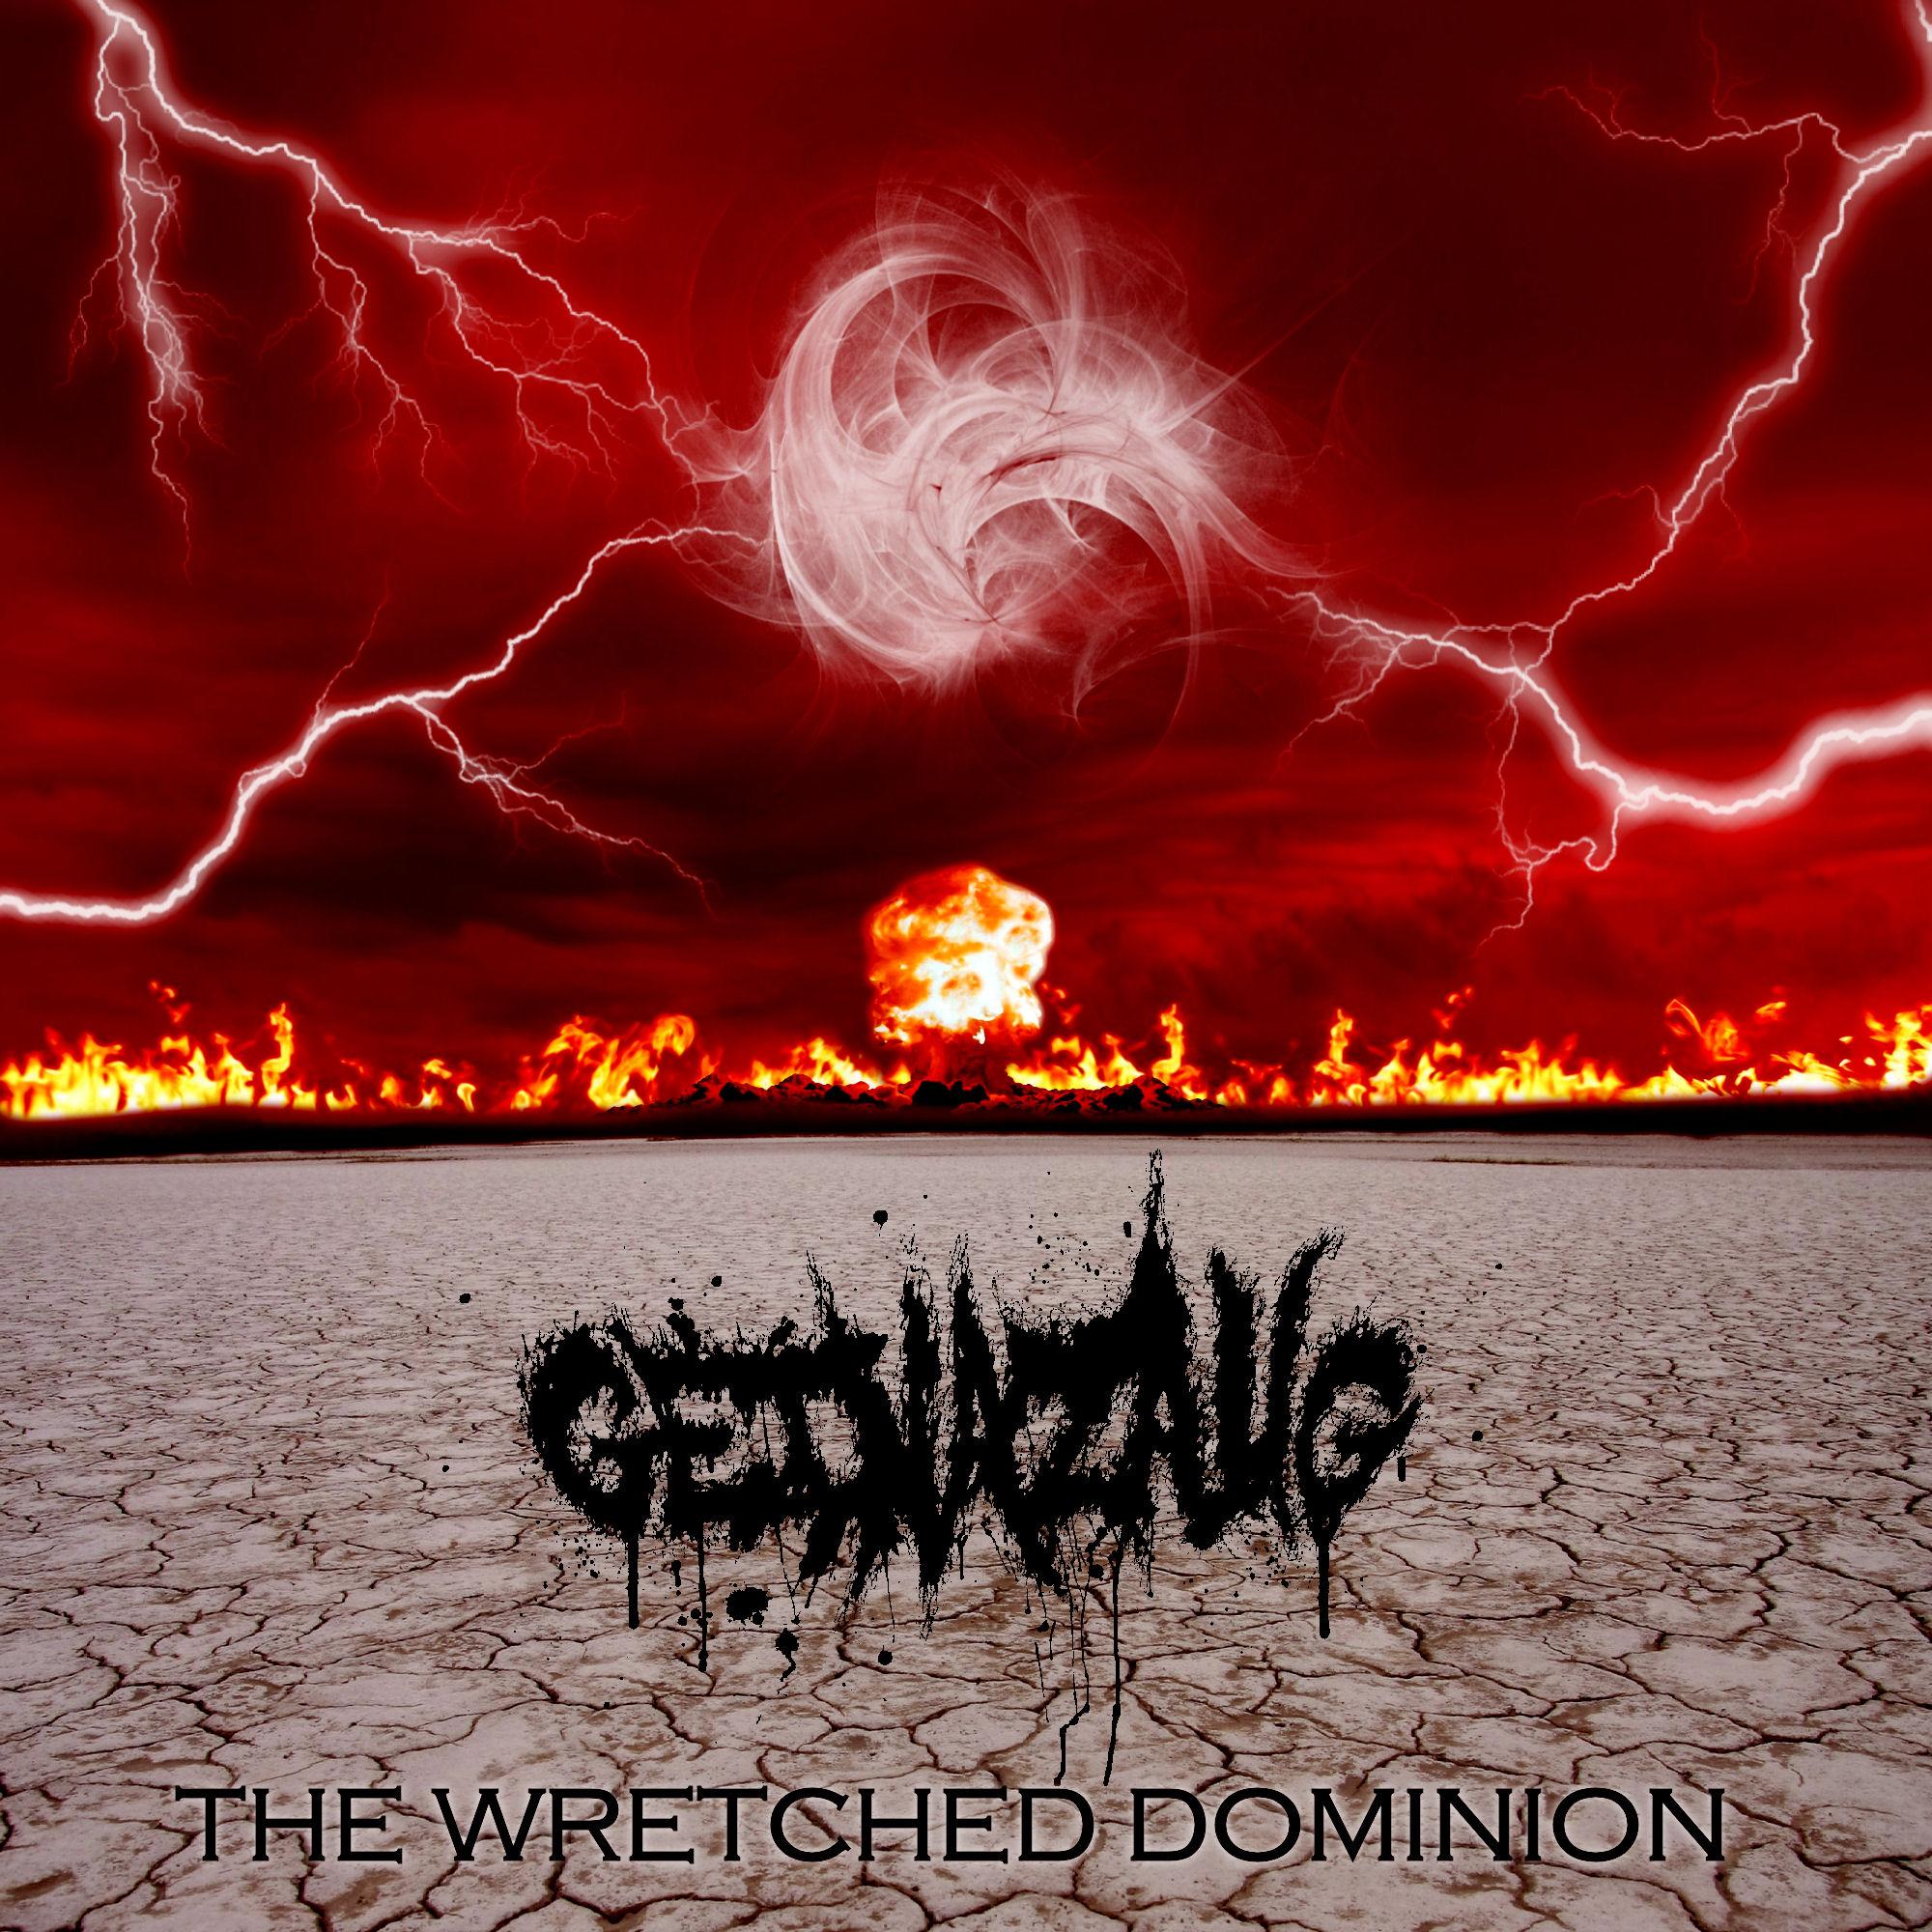 Geinazaug - The Wretched Dominion (2011)